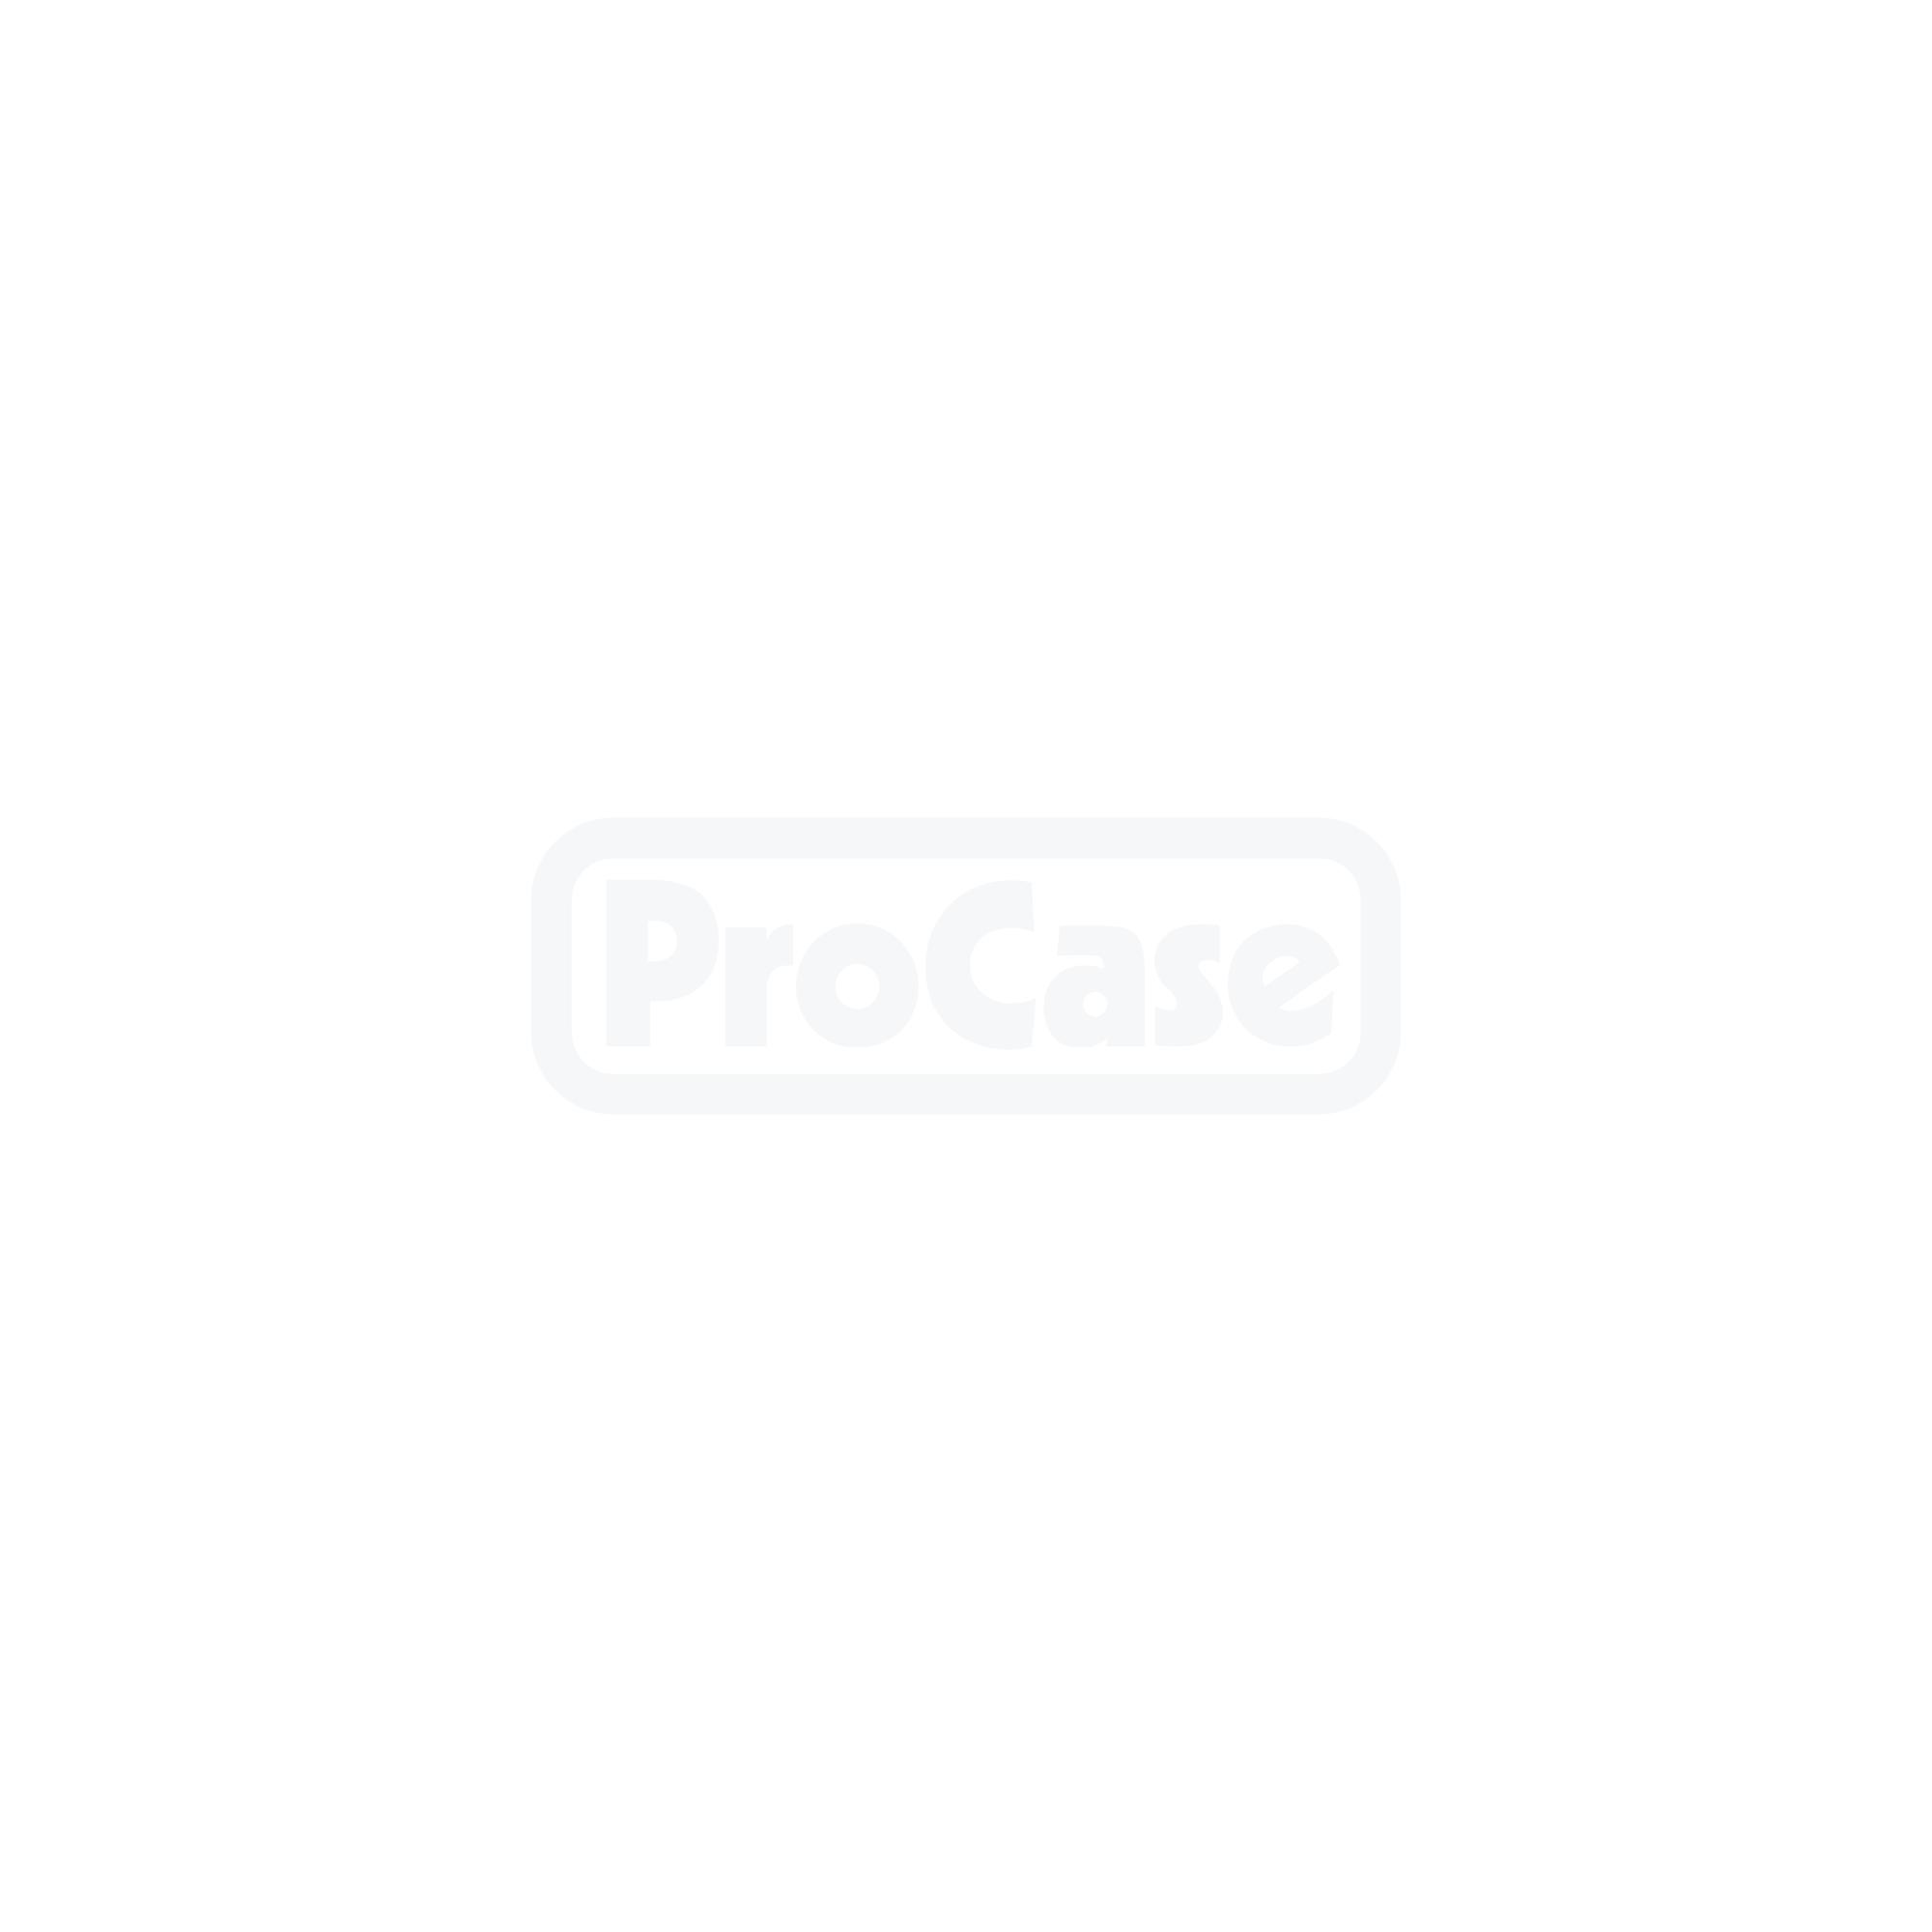 SKB 3R Koffer 2727-27B leer